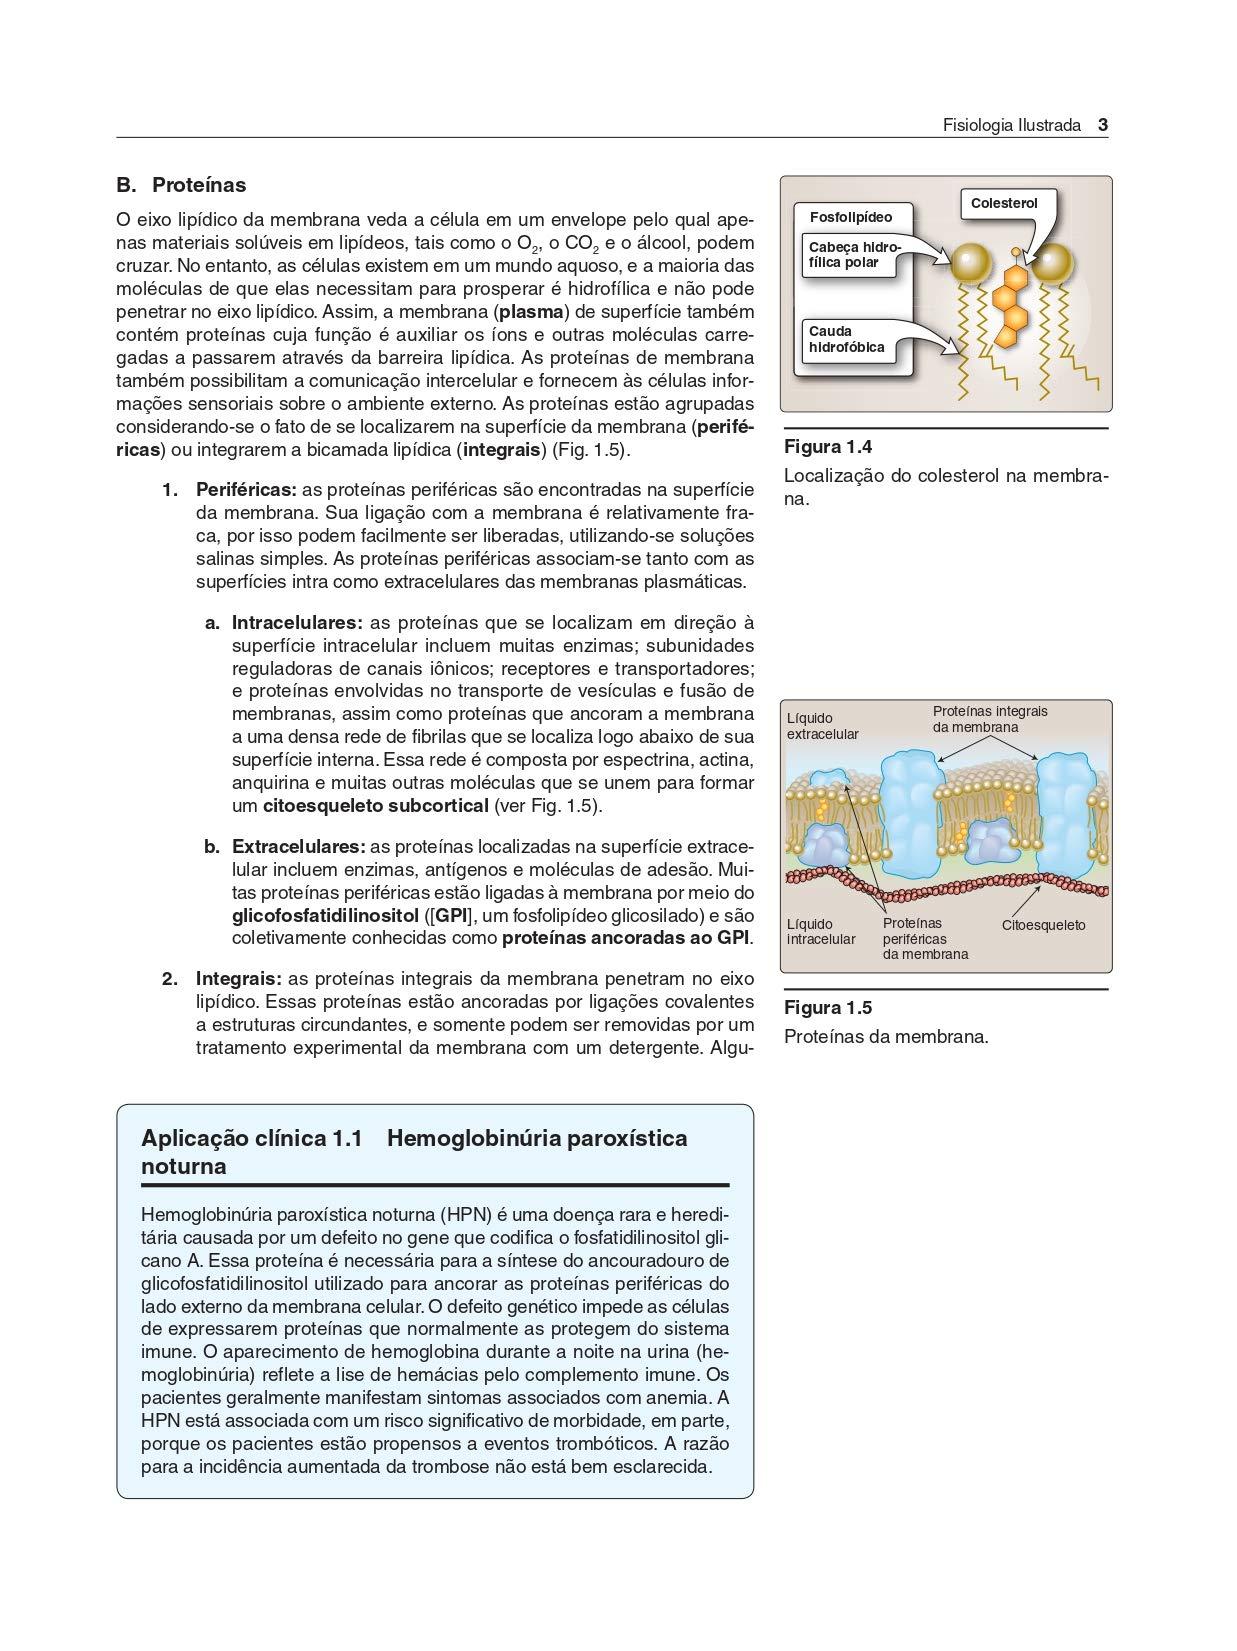 Fisiologia Ilustrada (Em Portuguese do Brasil): Amazon.es: Robin R ...